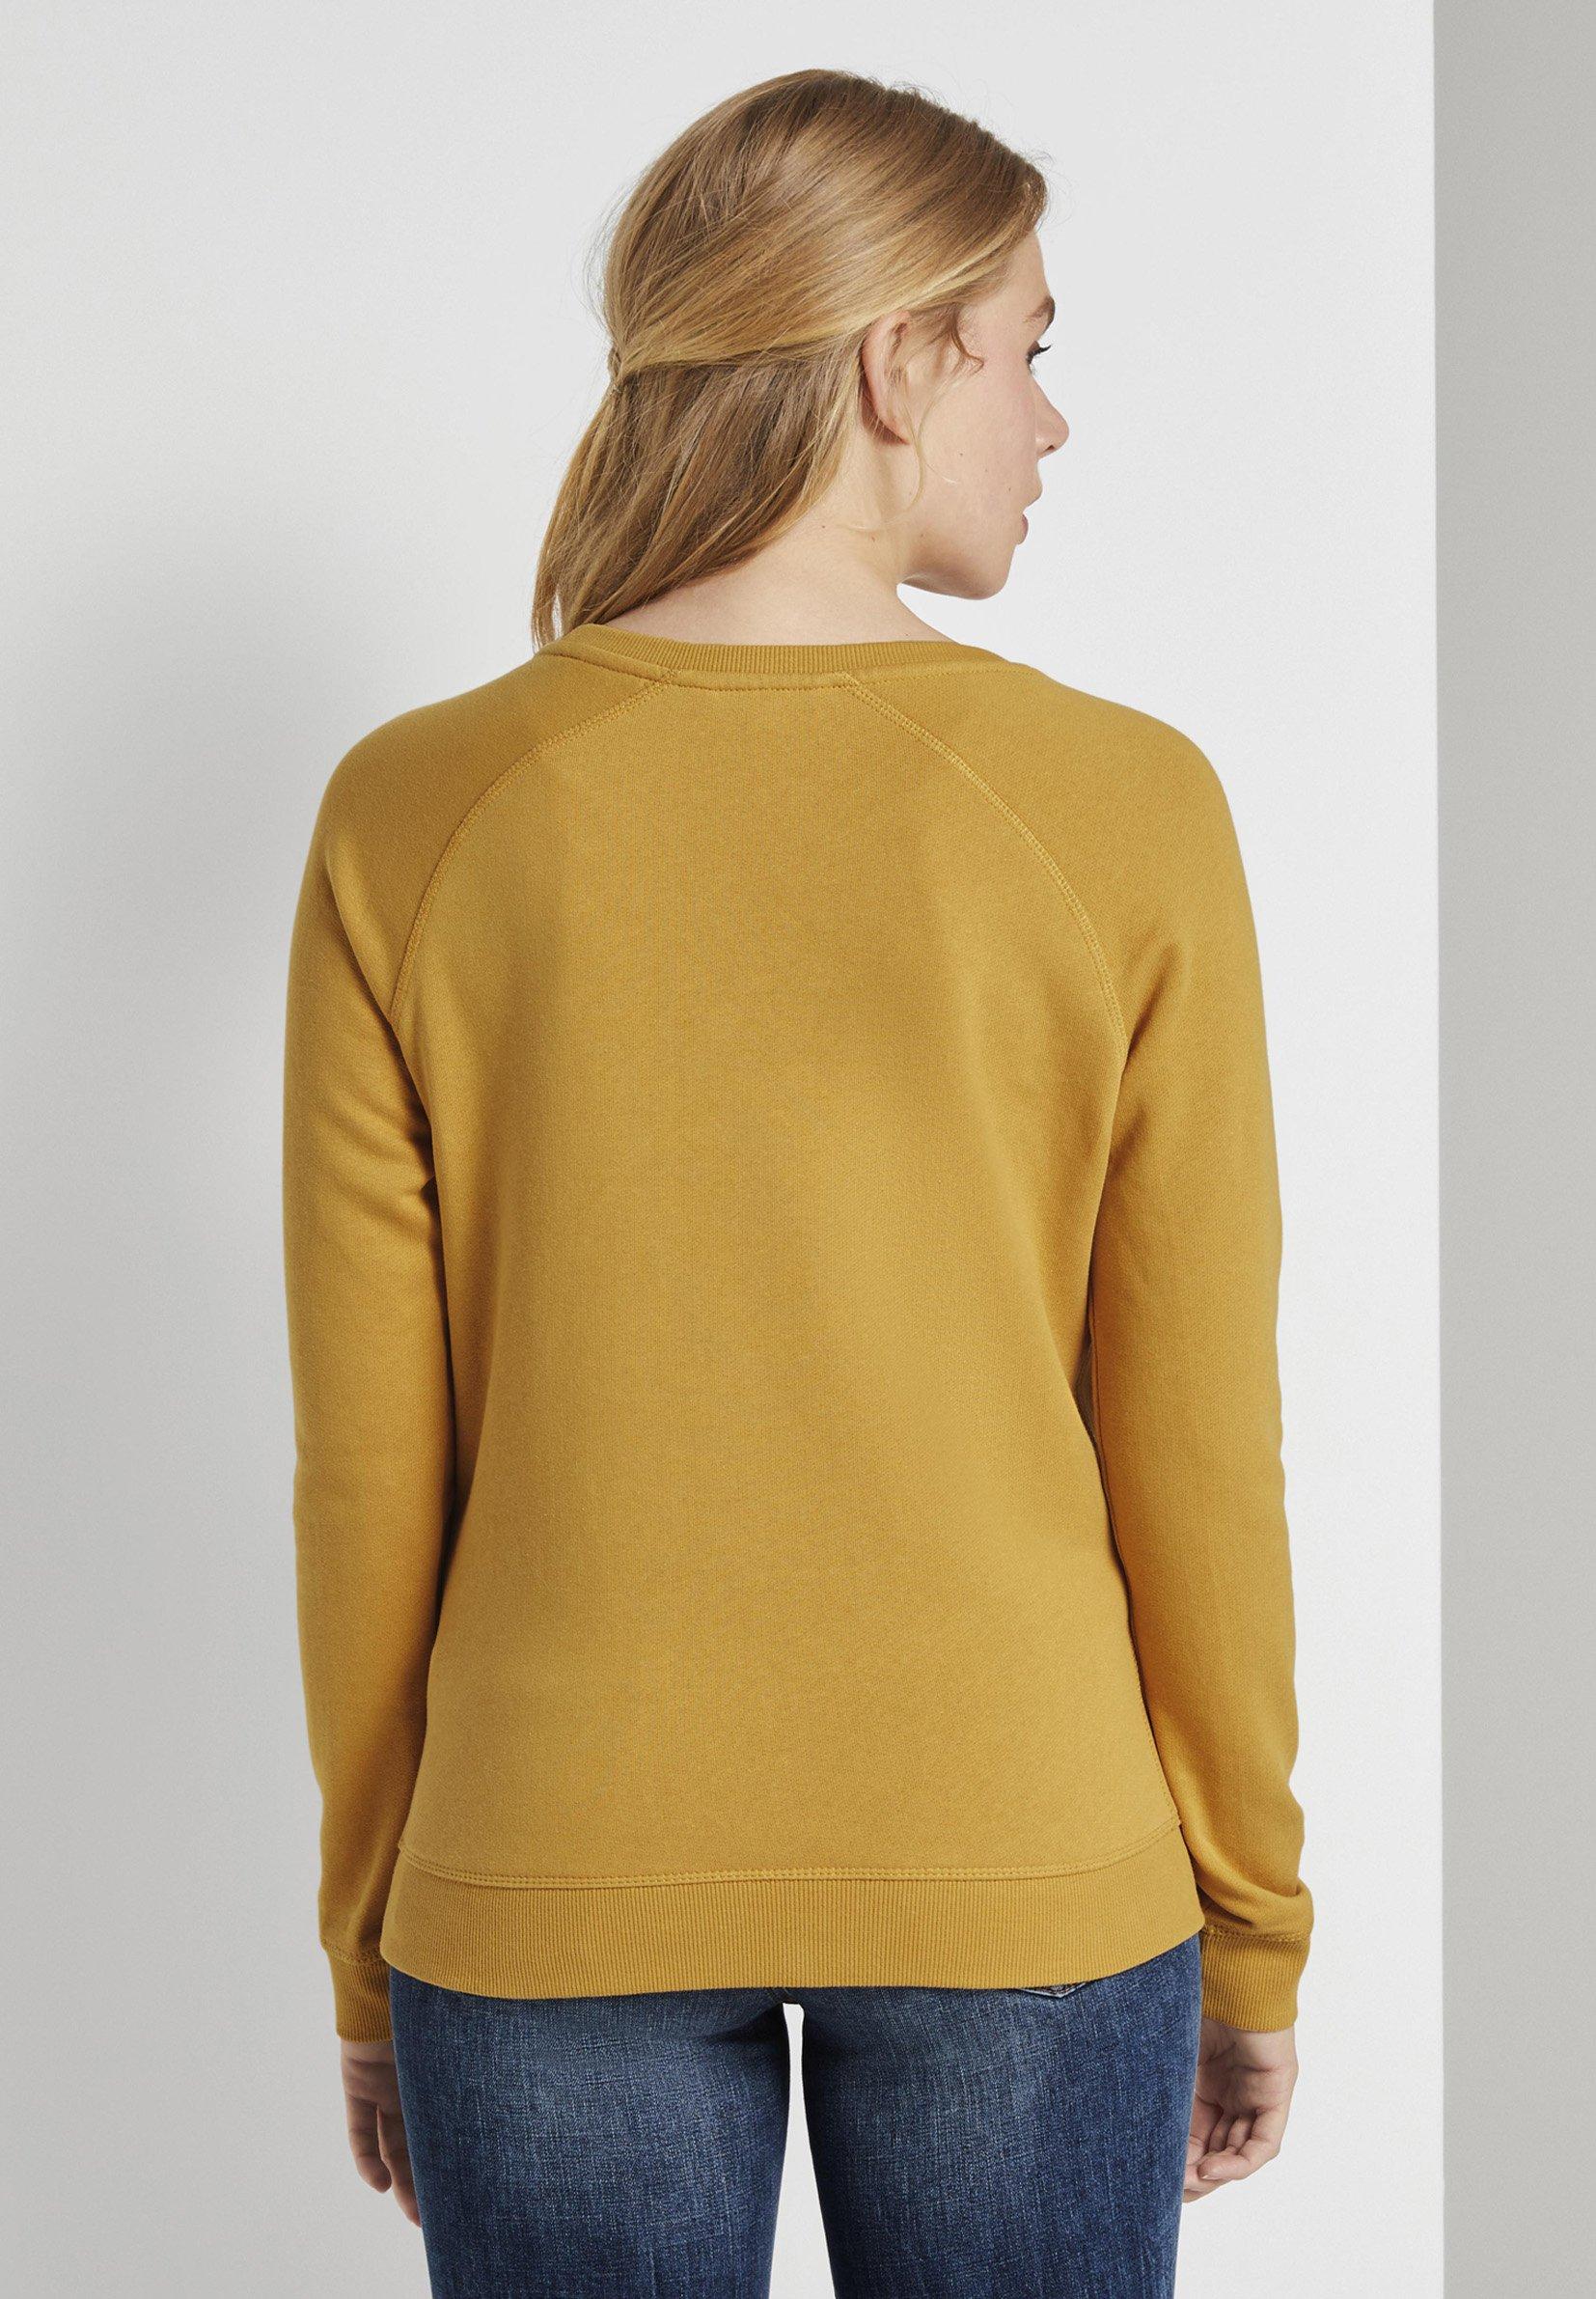 TOM TAILOR DENIM RAGLAN - Sweater - indian spice yellow - Dames jas Opruiming